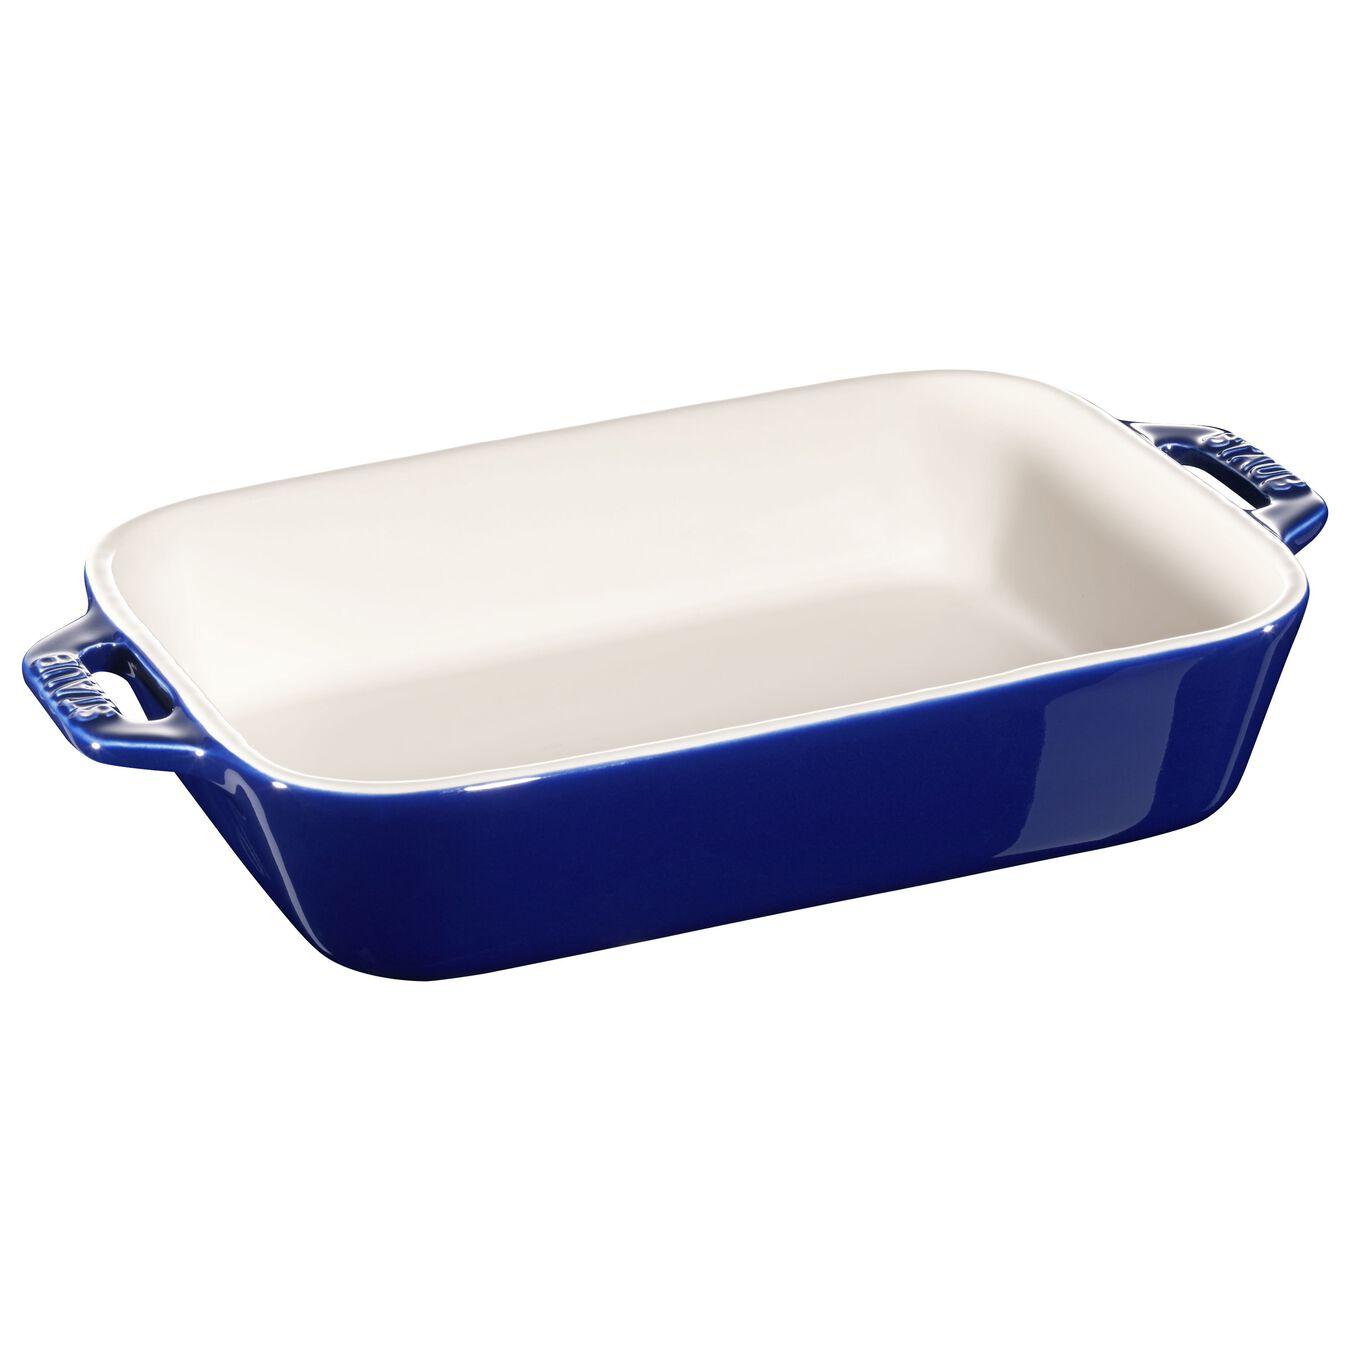 Ovenware set, 2 Piece | rectangular | dark-blue,,large 4